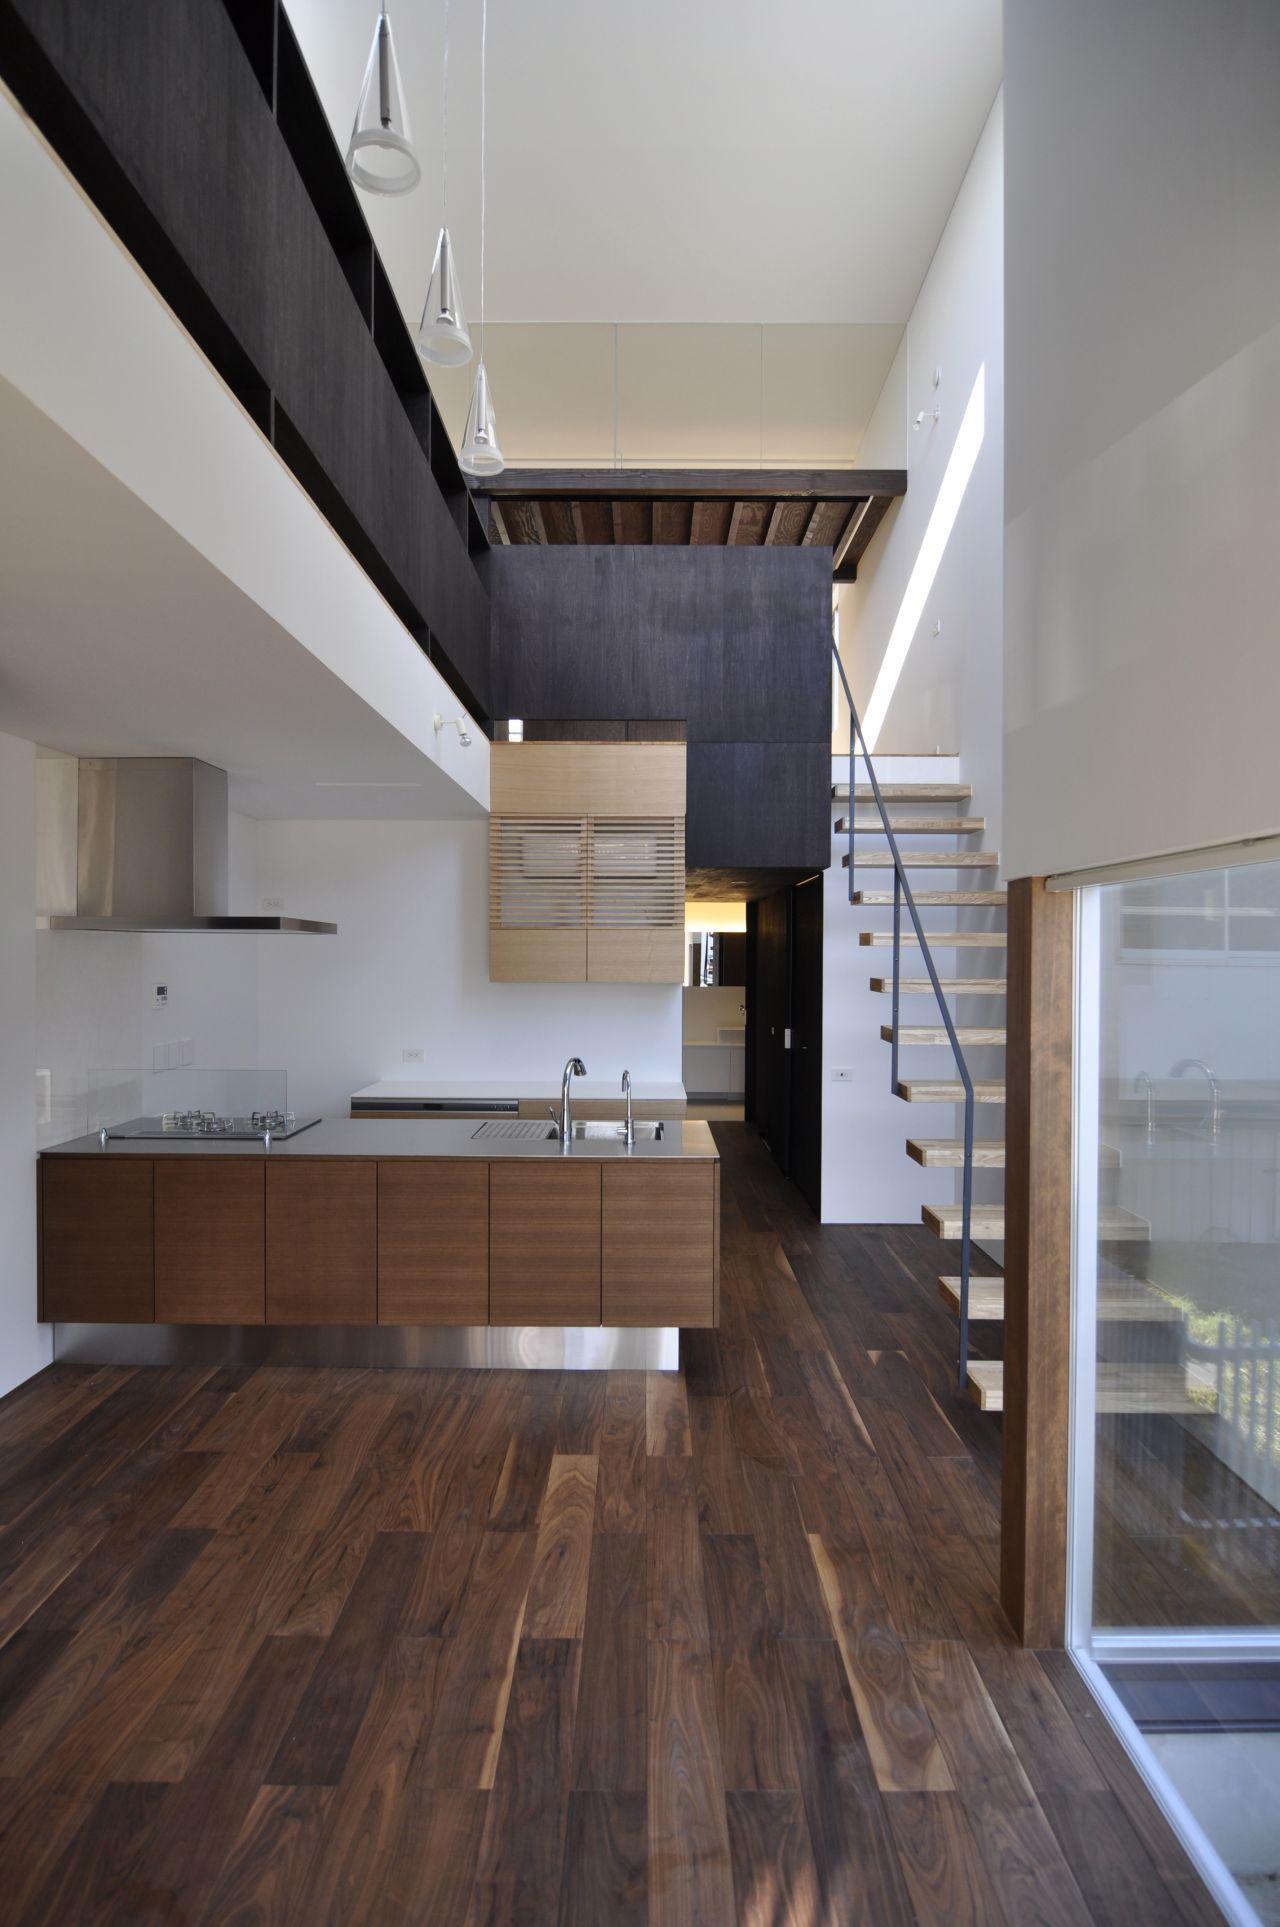 50770ba828ba0d35e1000011_e-house-d-i-g-architects_05.jpg 1 280 × 1 927 bildepunkter